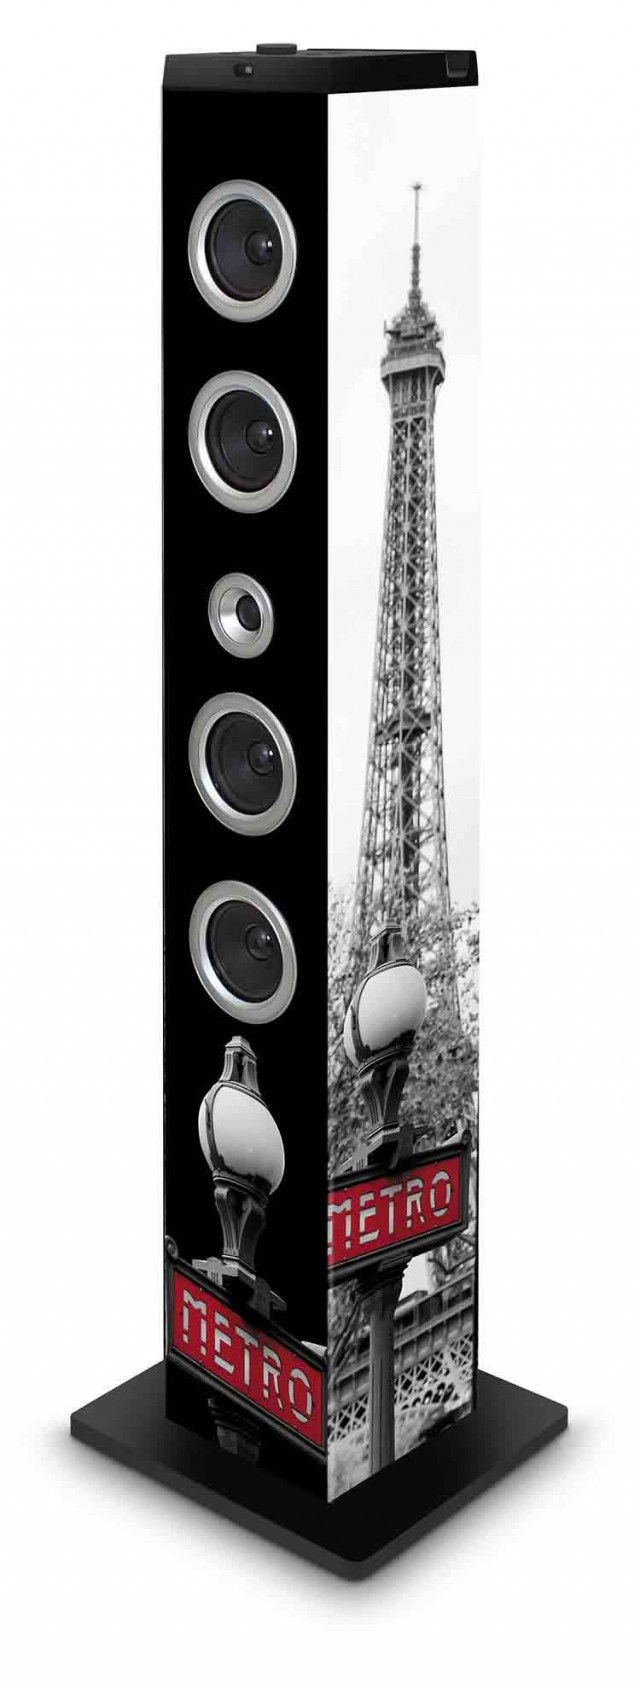 Multimedia Tower metro - Packshot